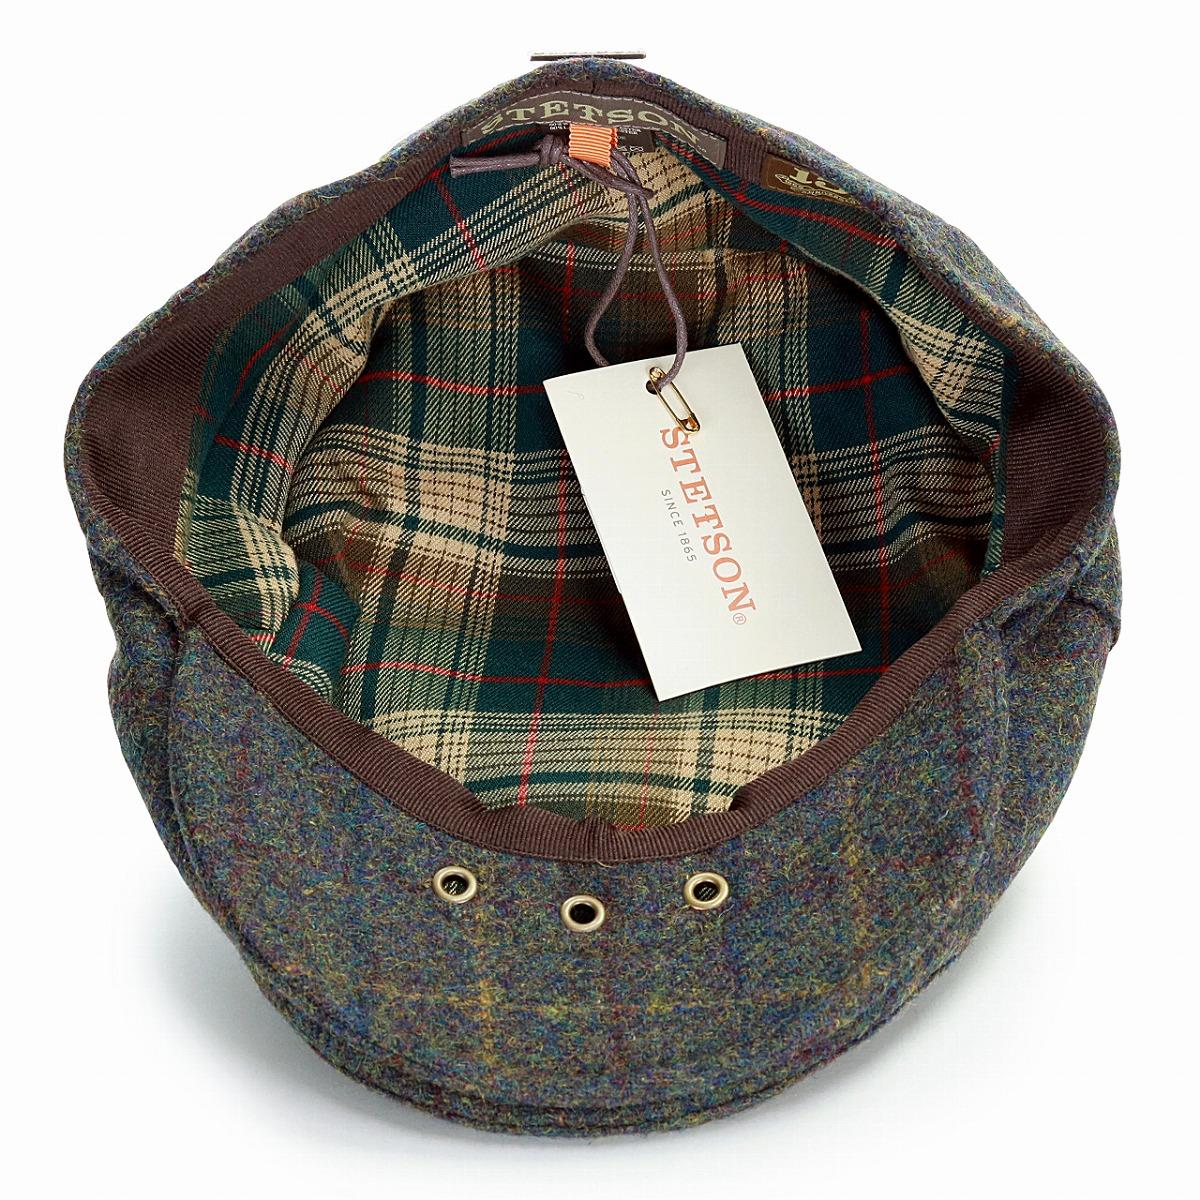 ... STETSON wool hunting cap men checked pattern Stetson hat USA import  brand hunting cap hat gentleman ... 2e8ebc533768